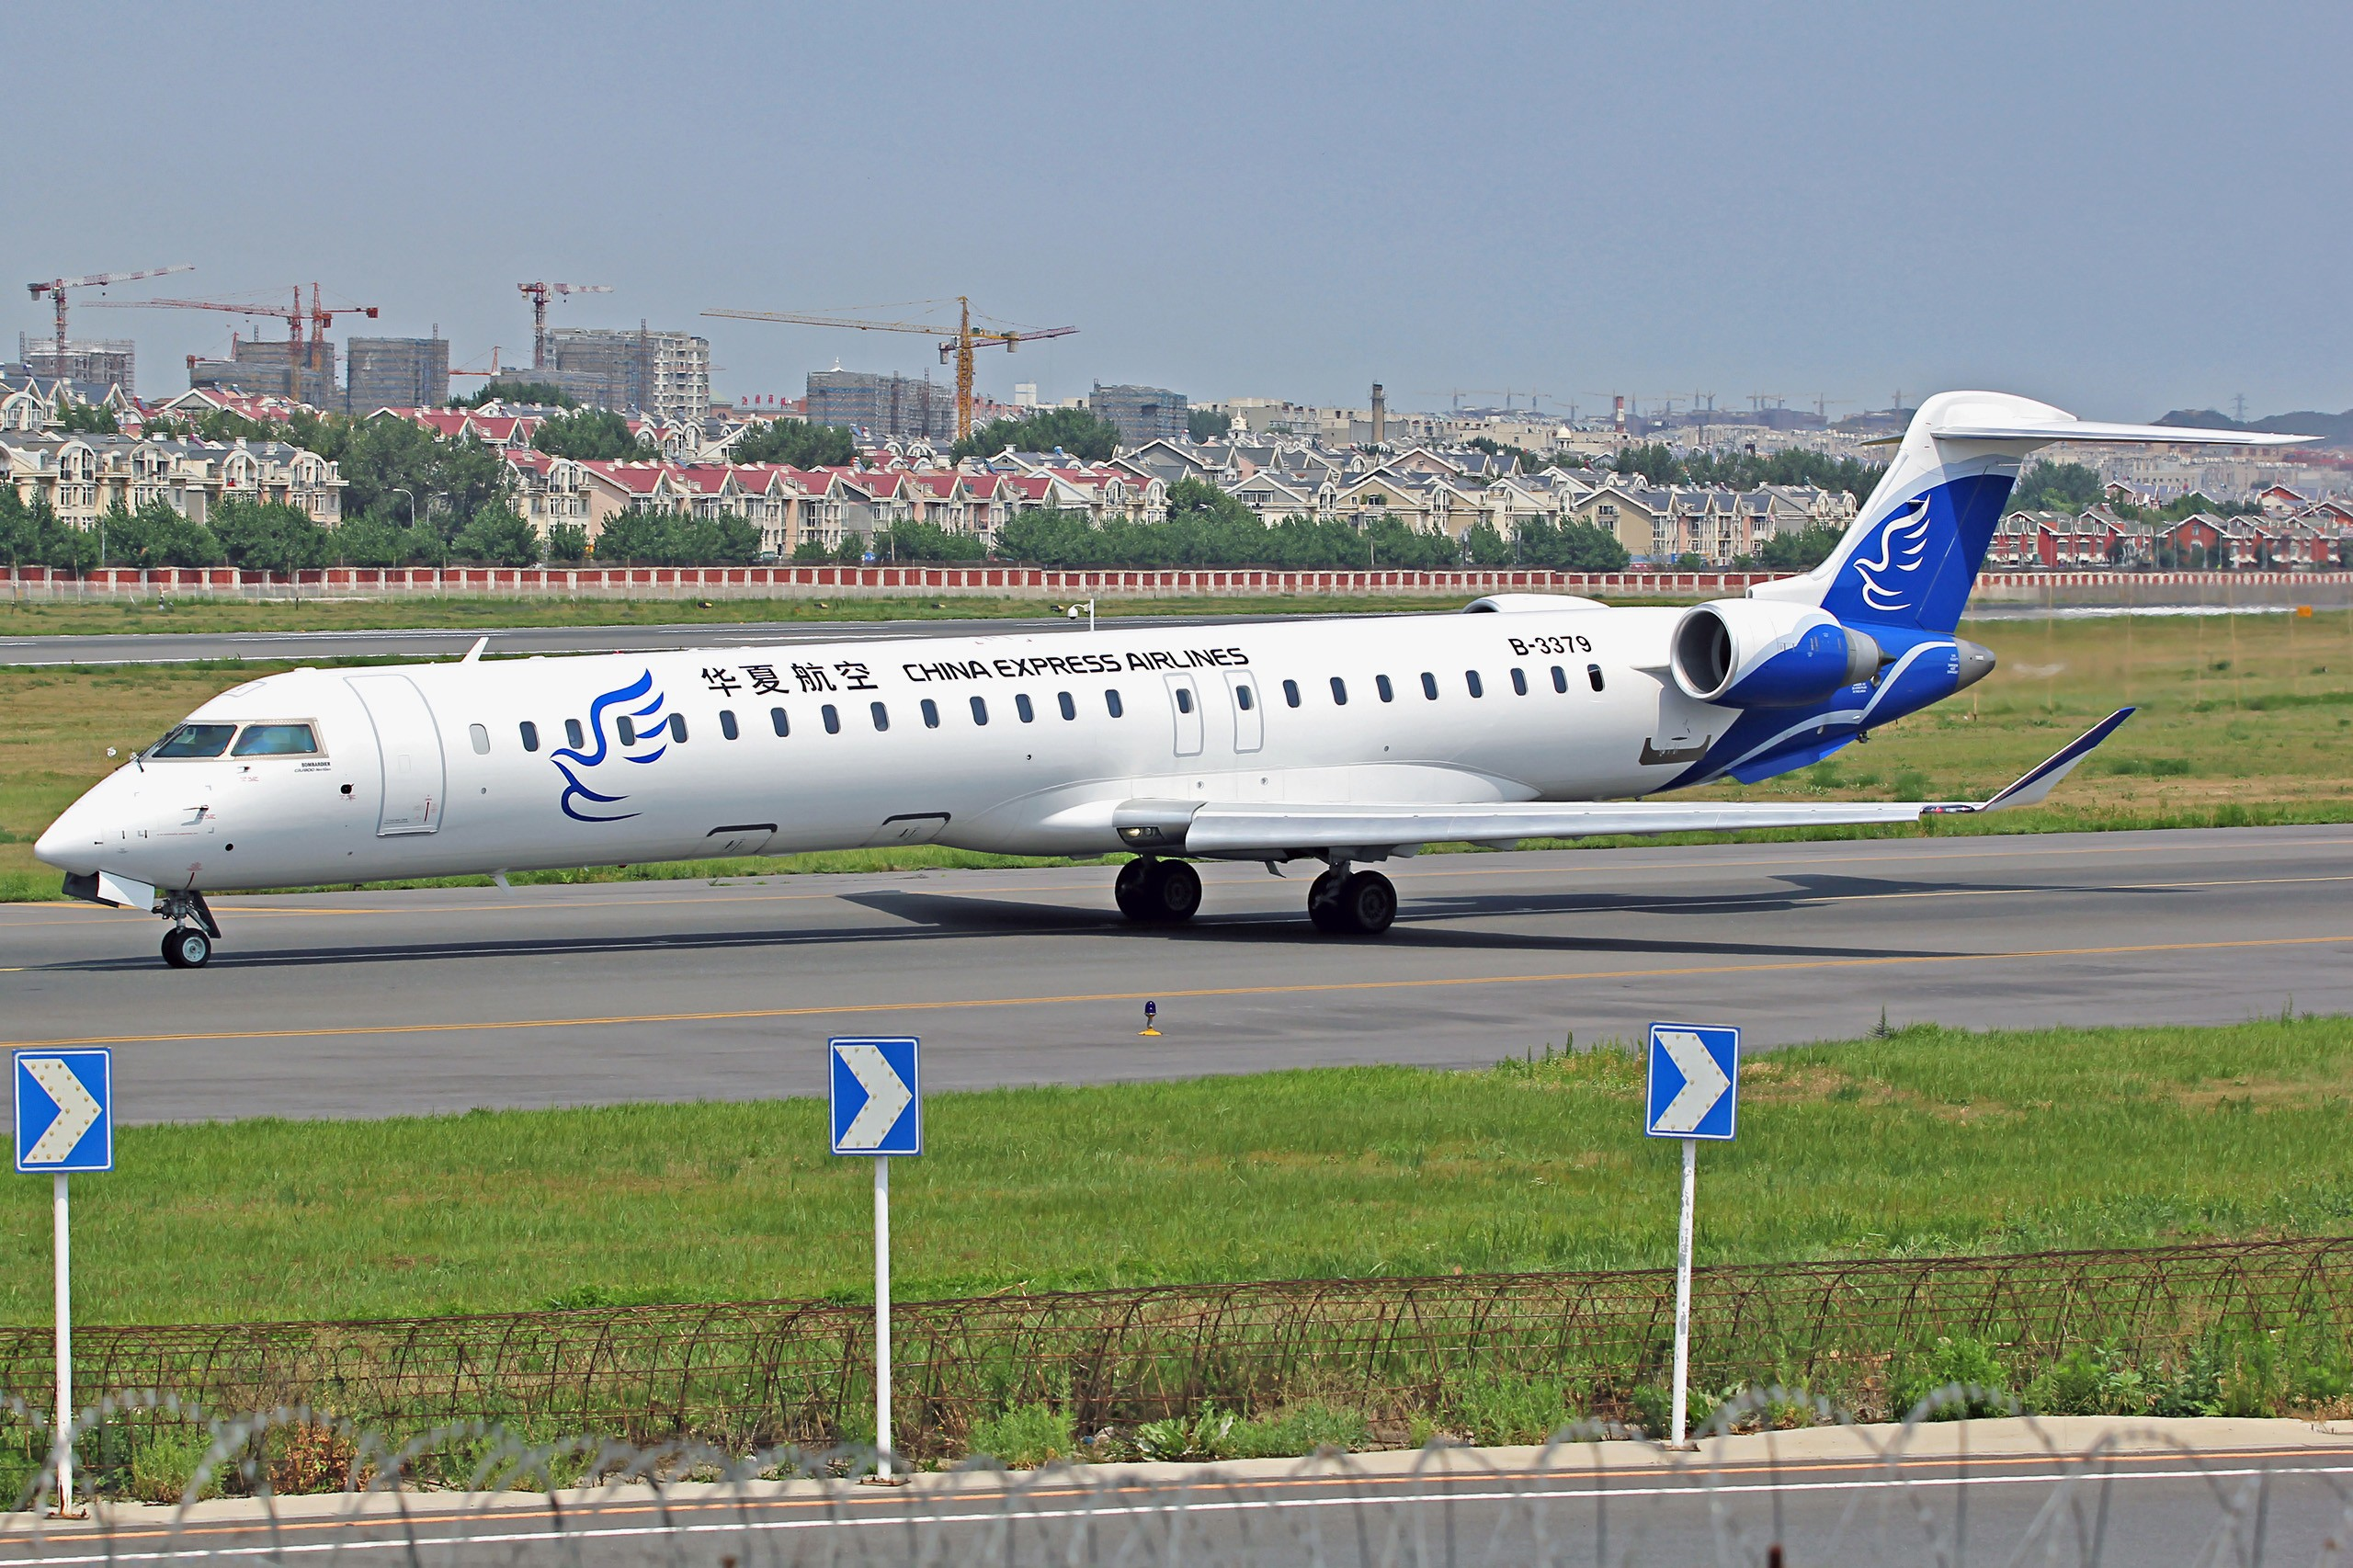 Re:[原创][DLC]...窄体机...2560x1707}Pix BOMBARDIER CRJ900NG B-3379 中国大连周水子国际机场